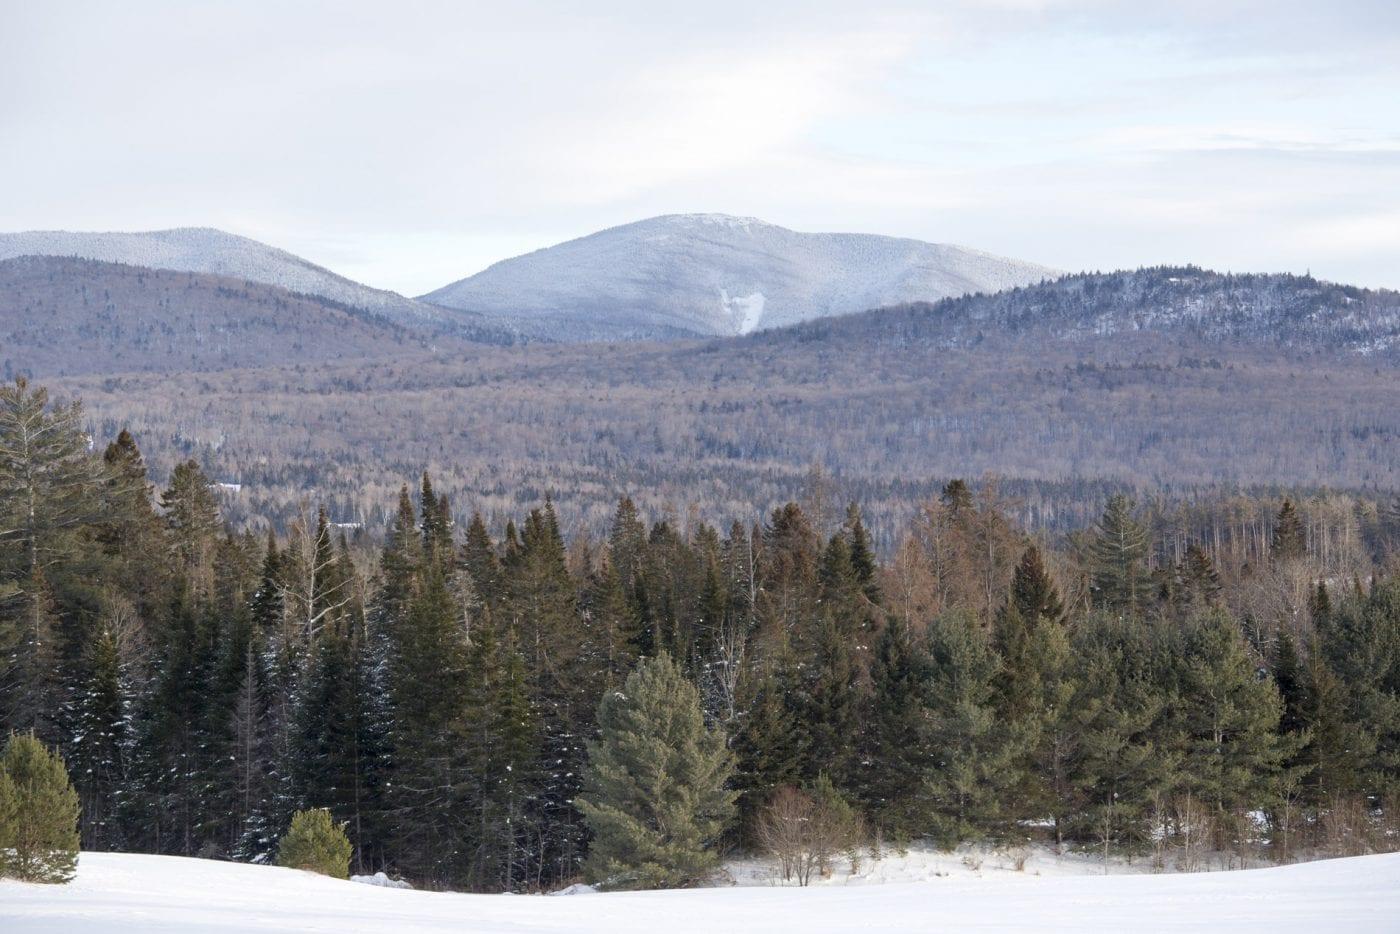 Snowy-Peaks-Adirondacks-Mike-Lynch-19